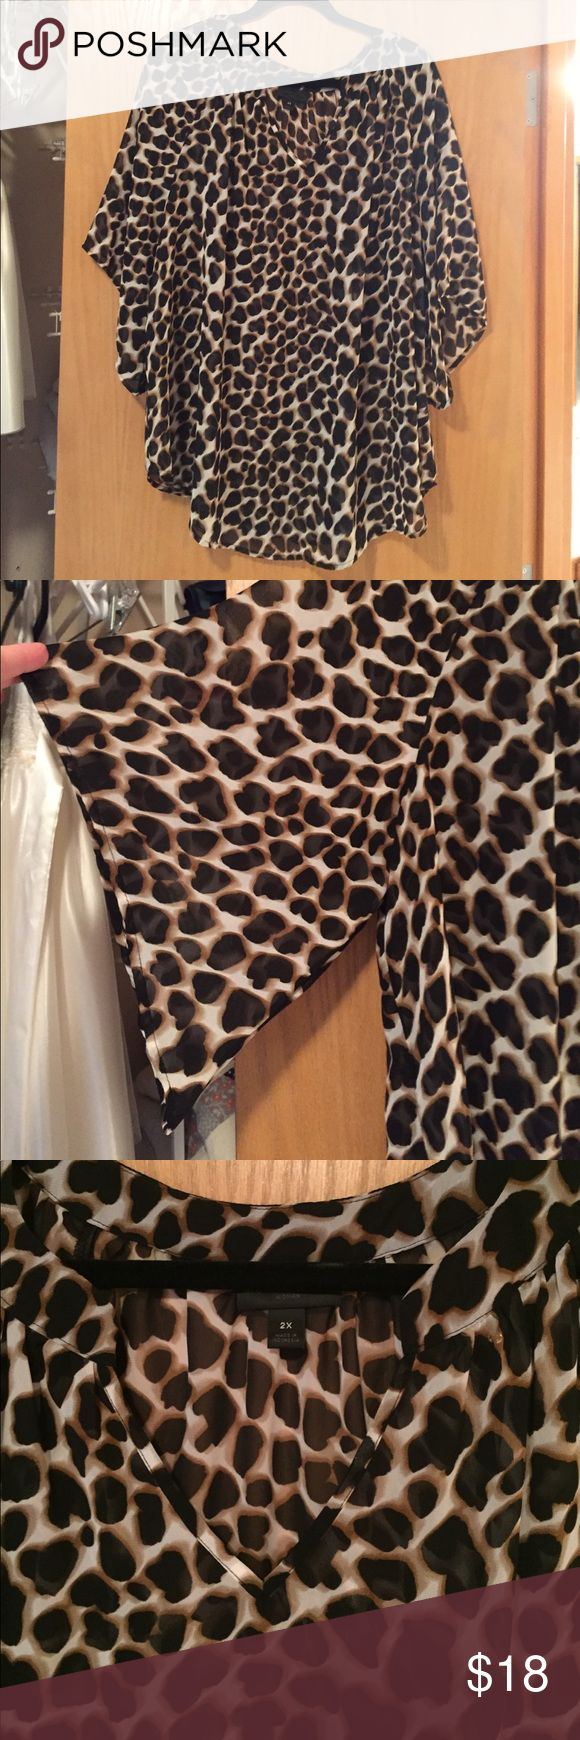 Sheer leopard print top Sheer leopard print shirt sleeved shirt. Cute flared sleeves. V- neck, pullover. 100% polyester Worthington Tops Blouses